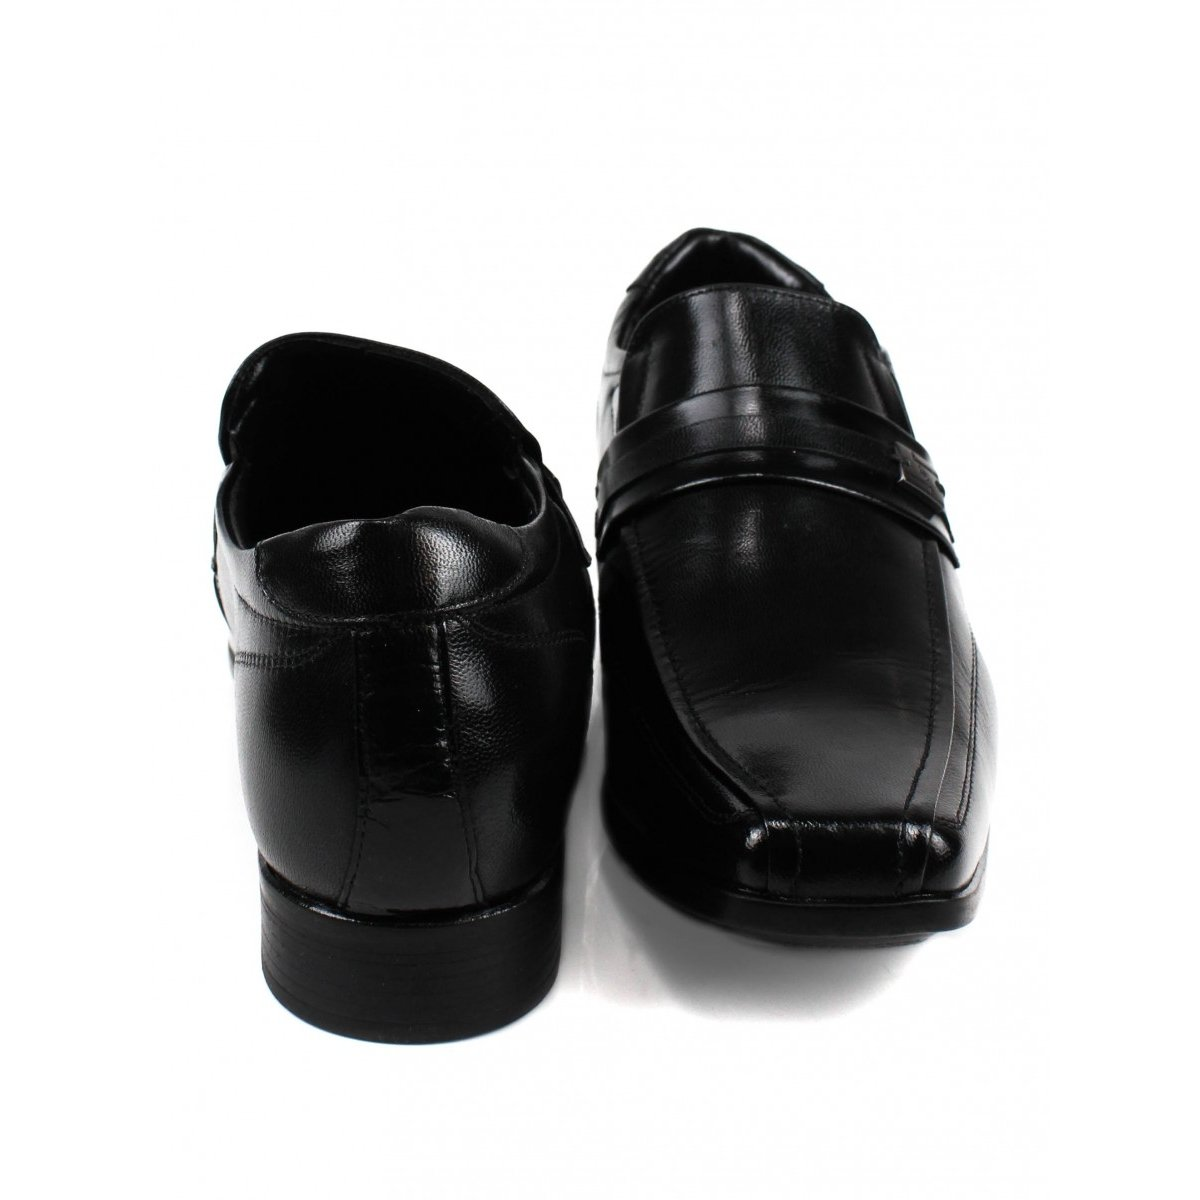 Sapato Sapato Metal Preto Jota Metal Preto Pe Jota Pe Bvra1wB